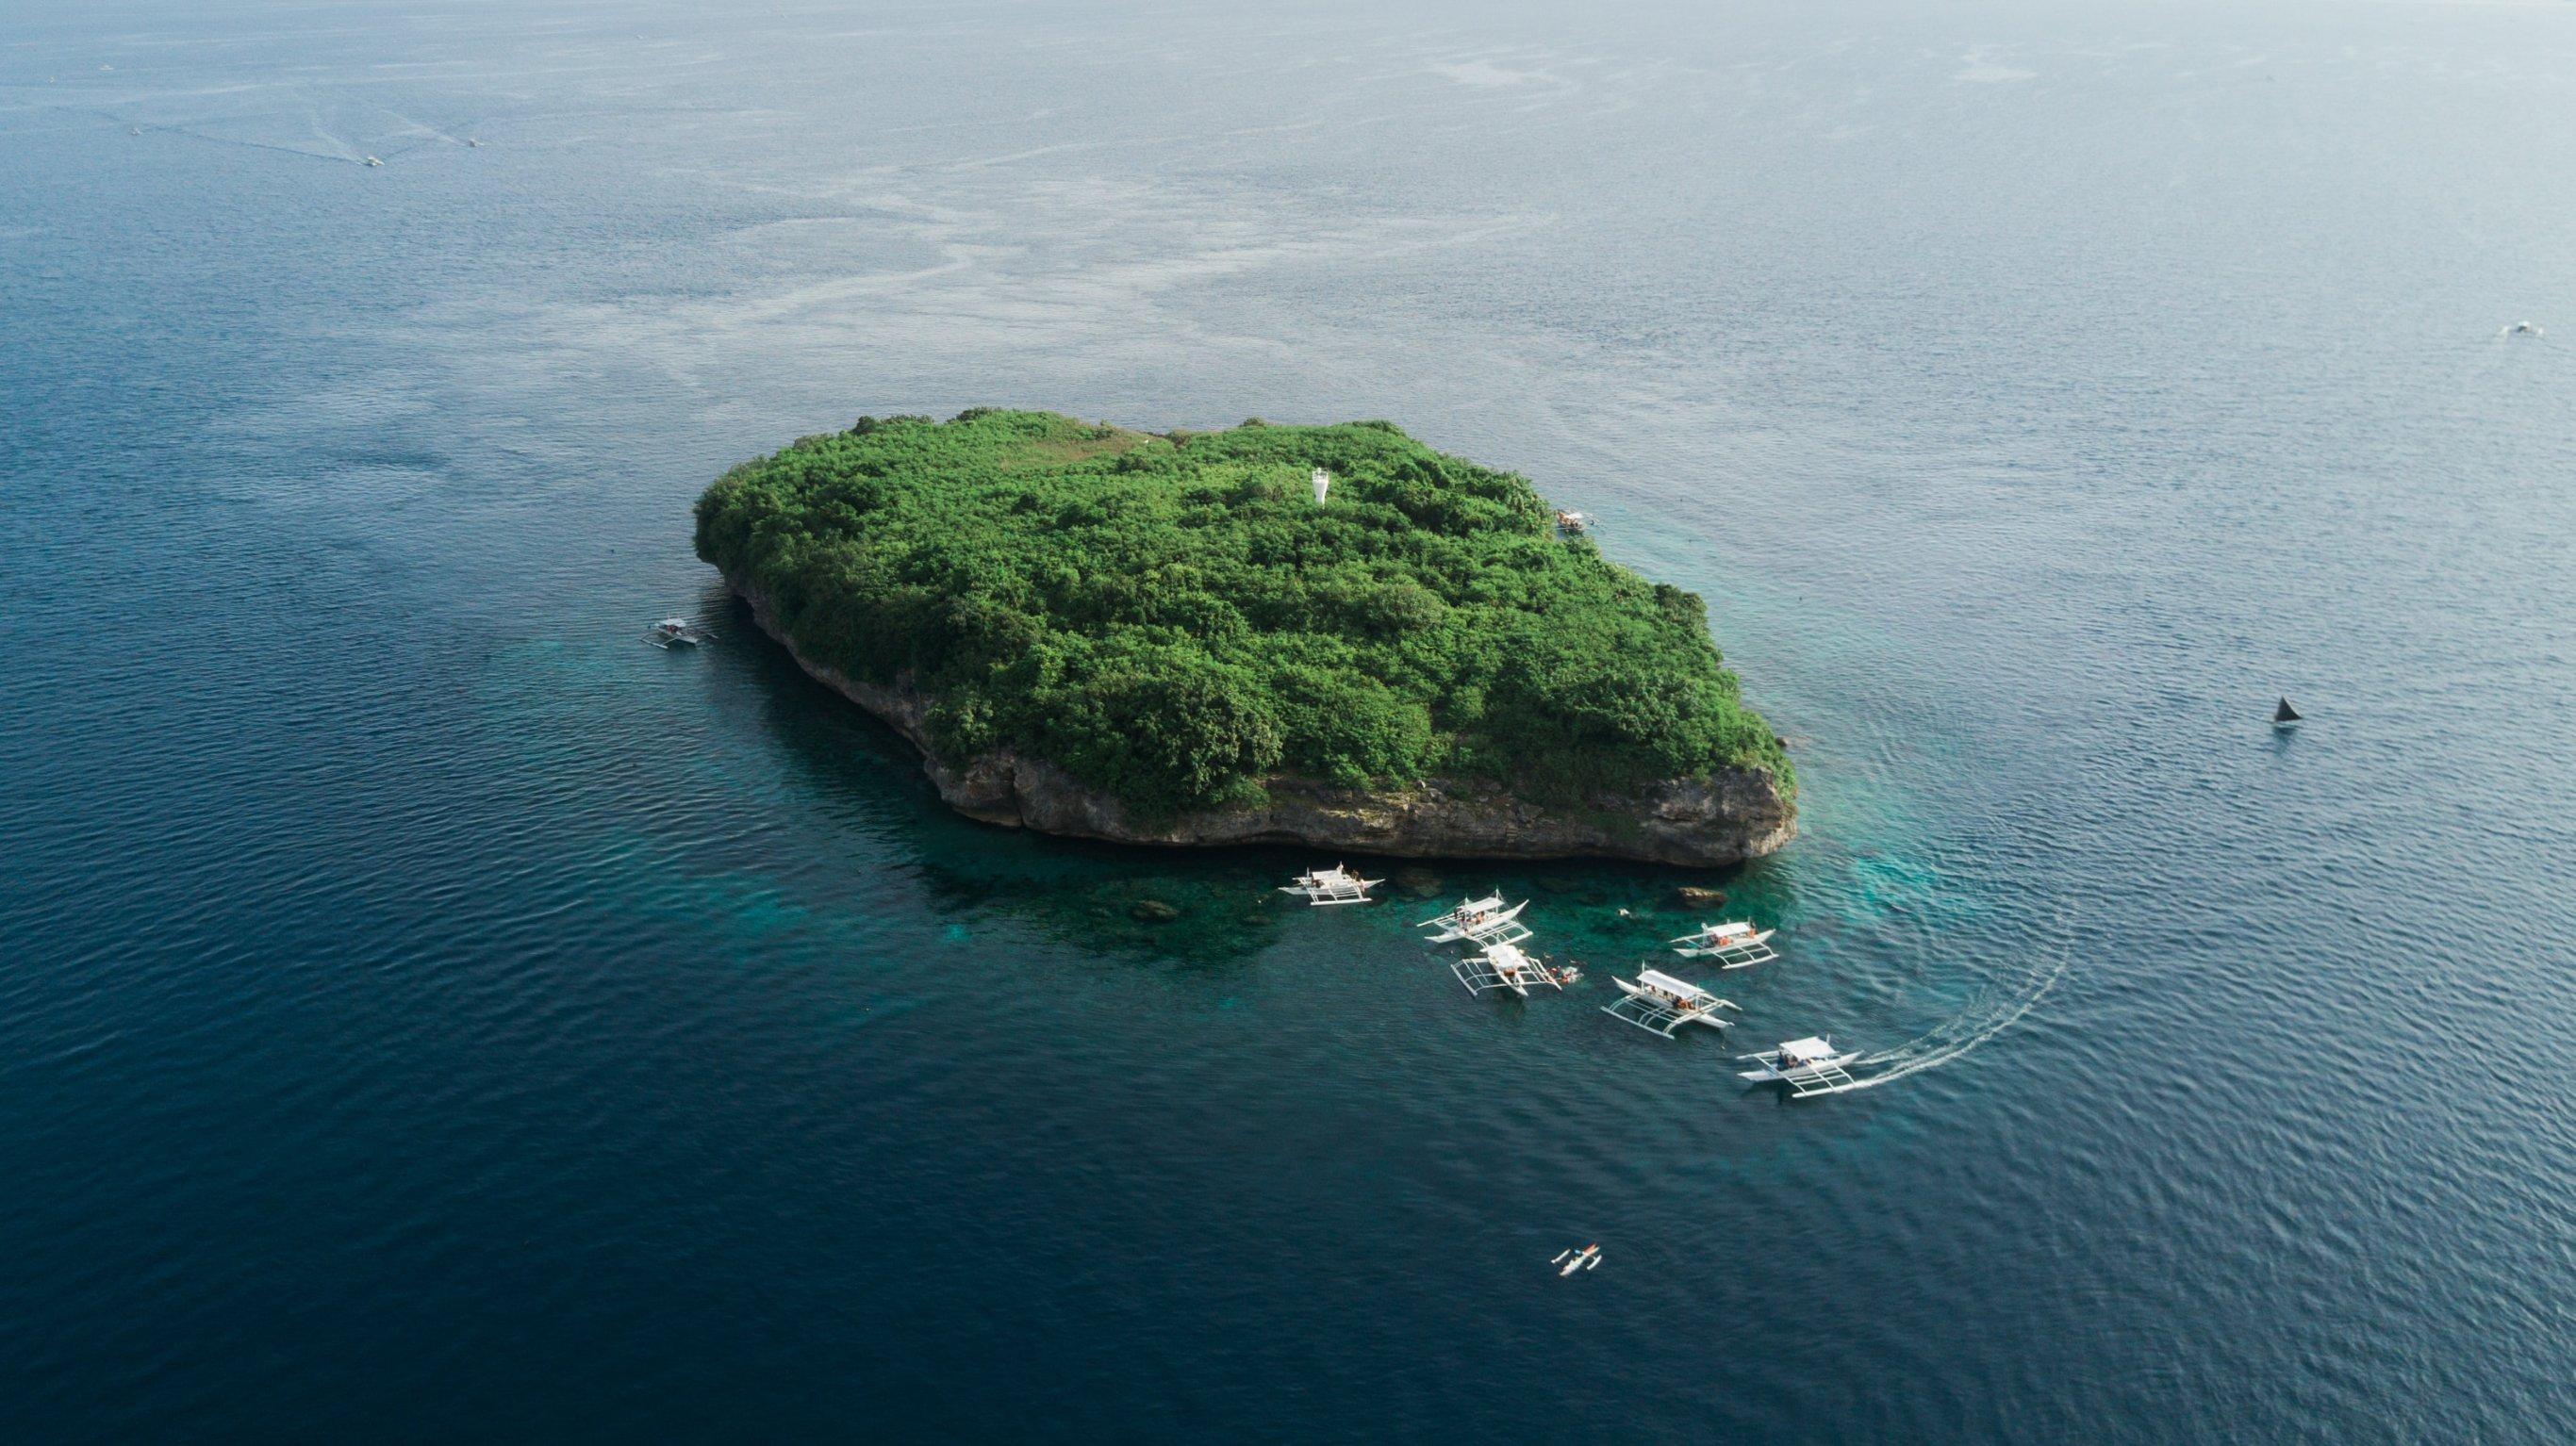 8-Day Cebu & Bohol Trip - Philippines Itinerary